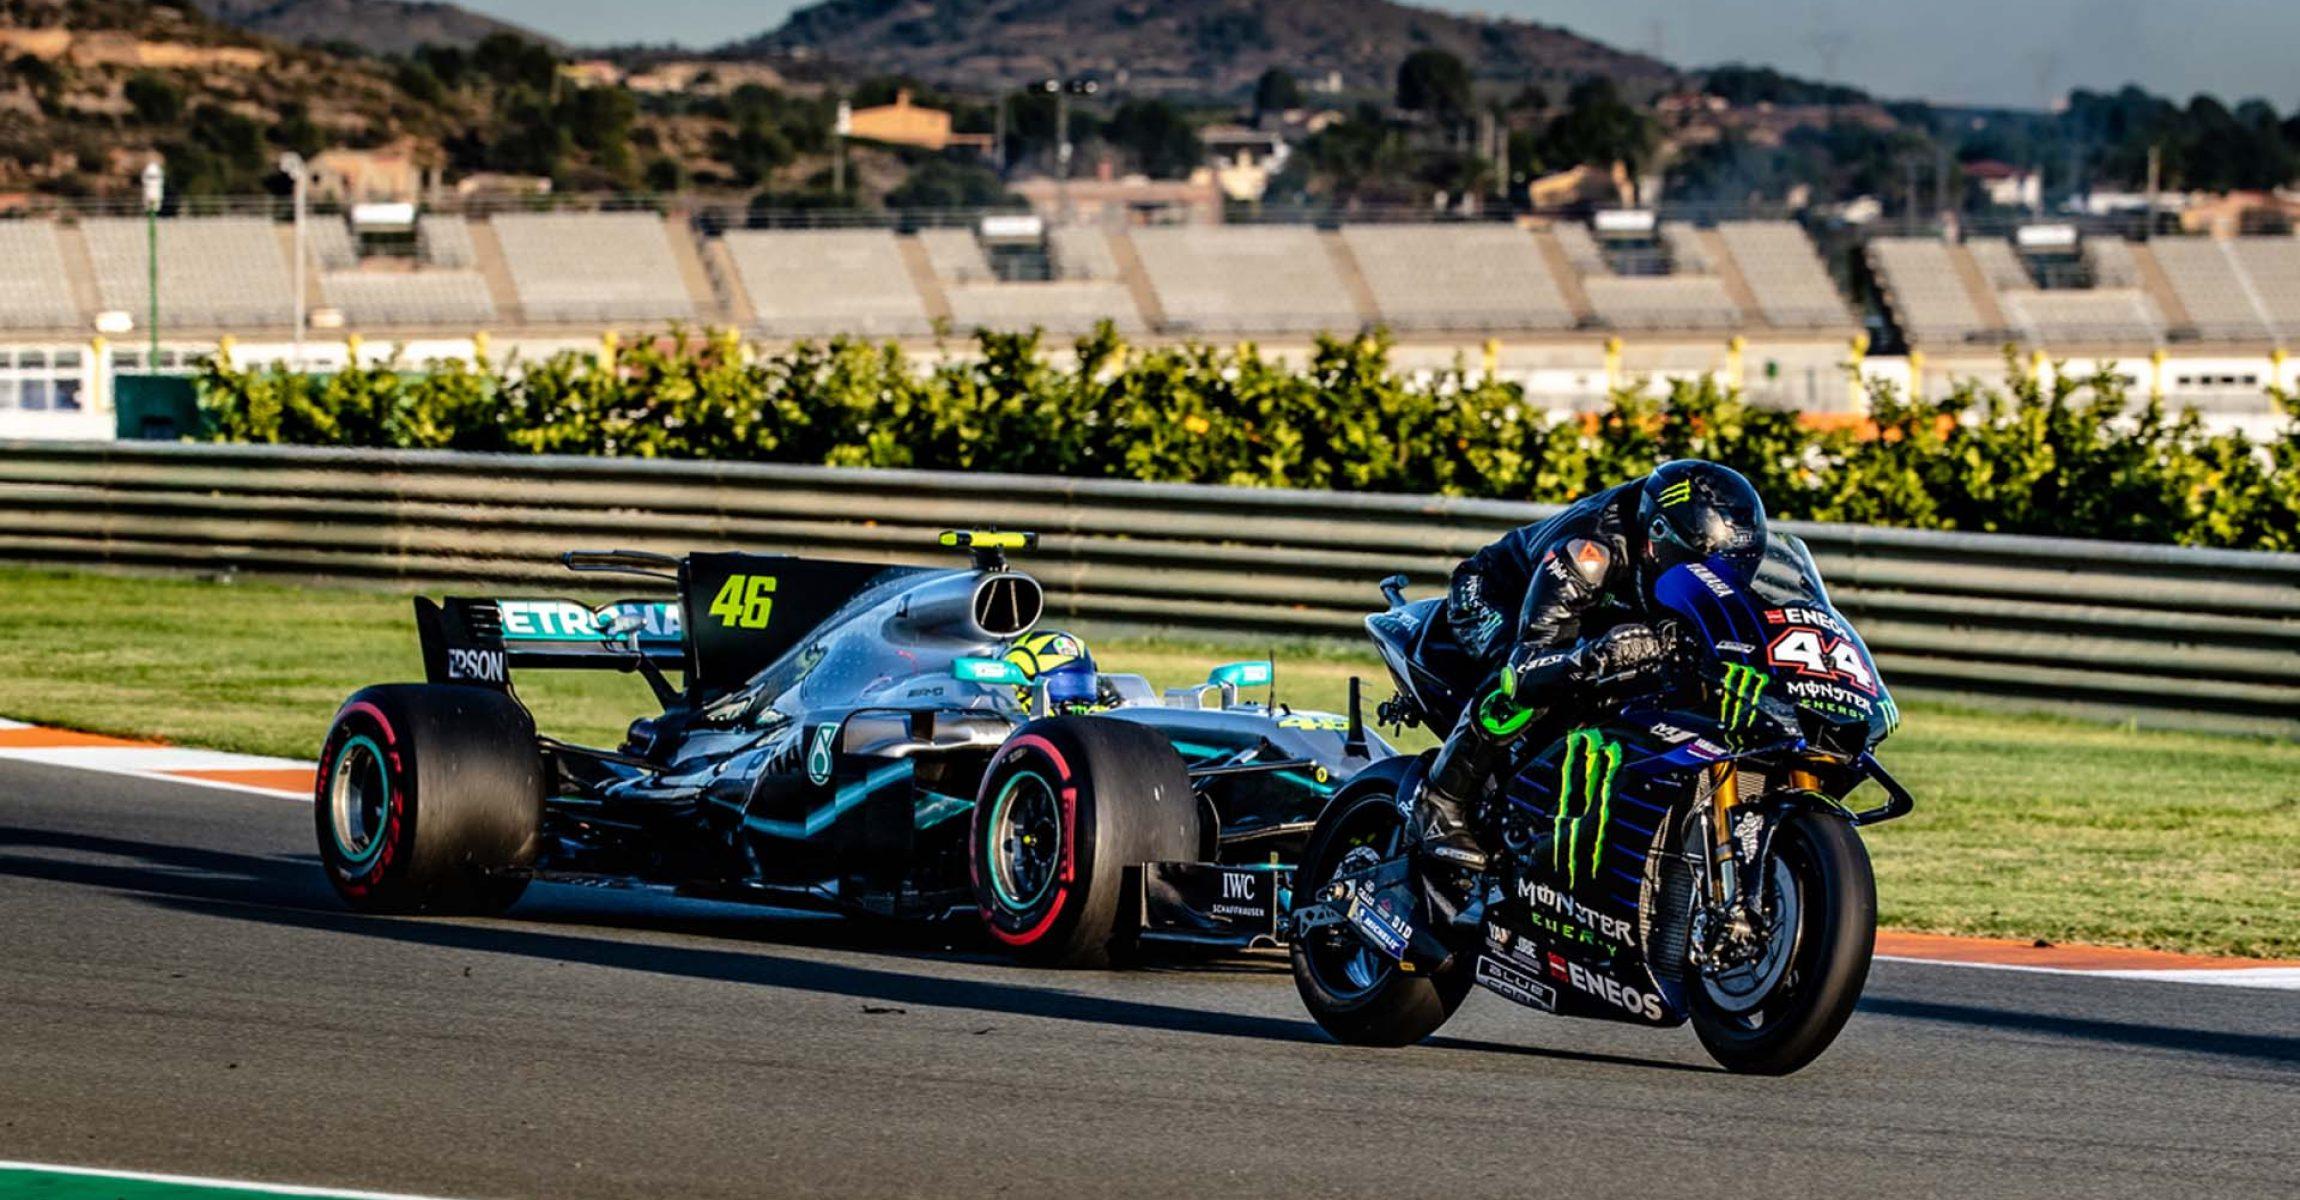 Valentino Rossi, Lewis Hamilton, Mercedes, Yamaha